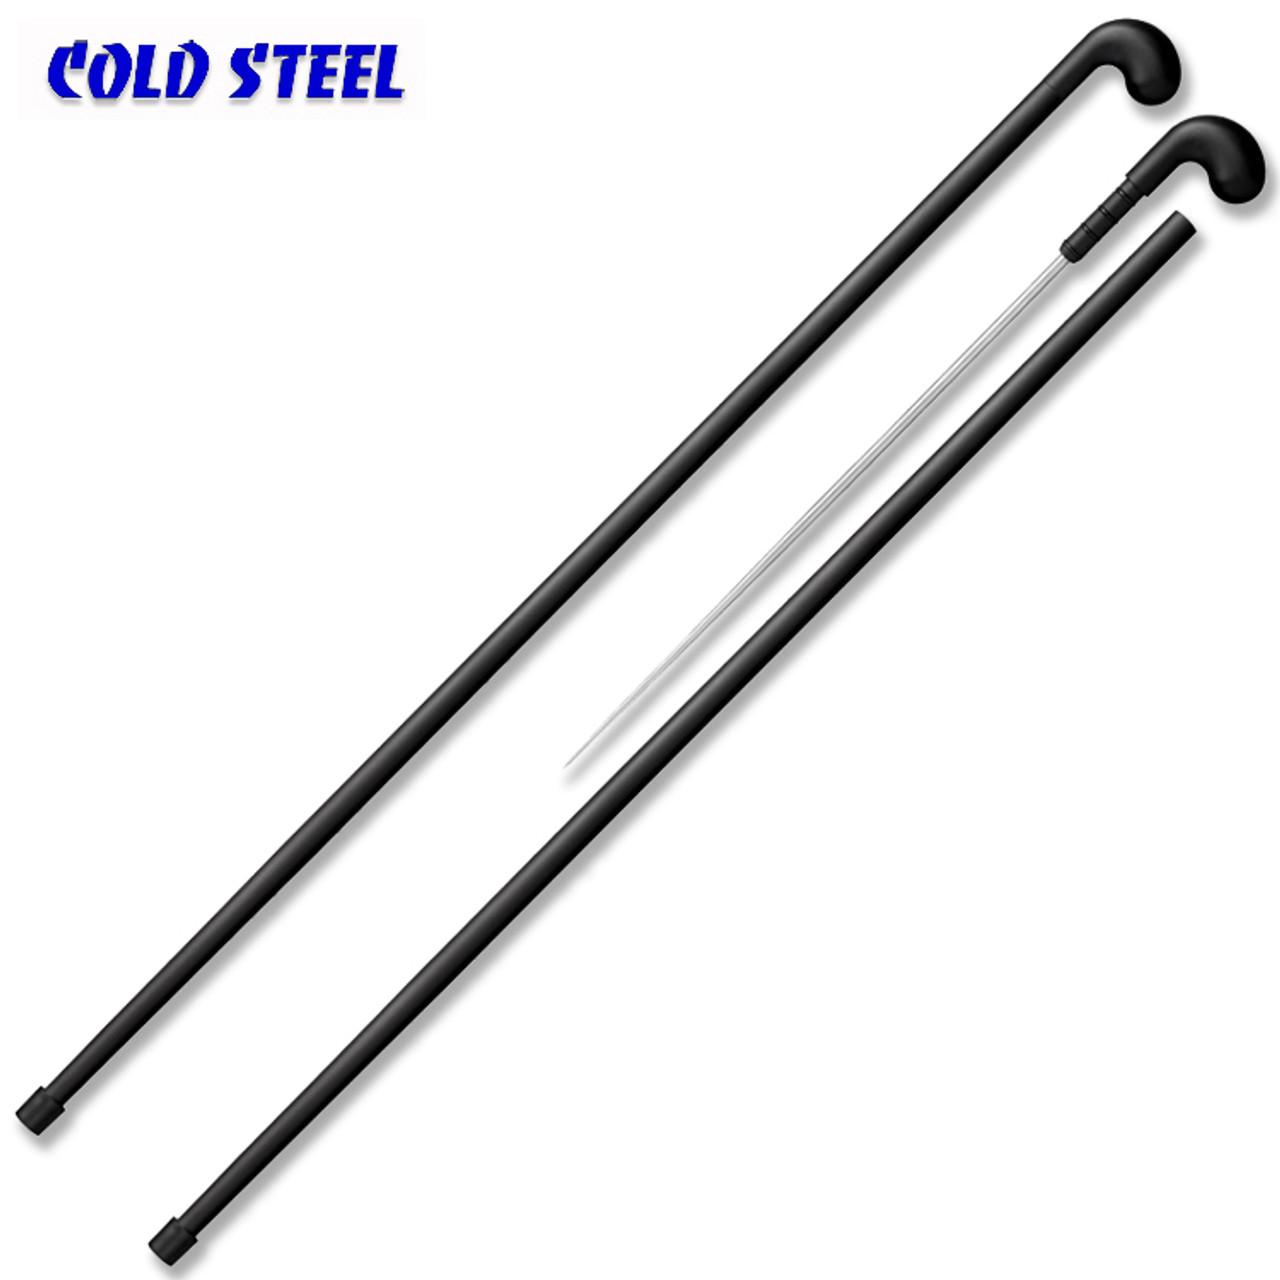 Cold Steel 88SCFE Quick Draw Sword Cane w/Grivory Grip & Aluminum Shaft -  18 0